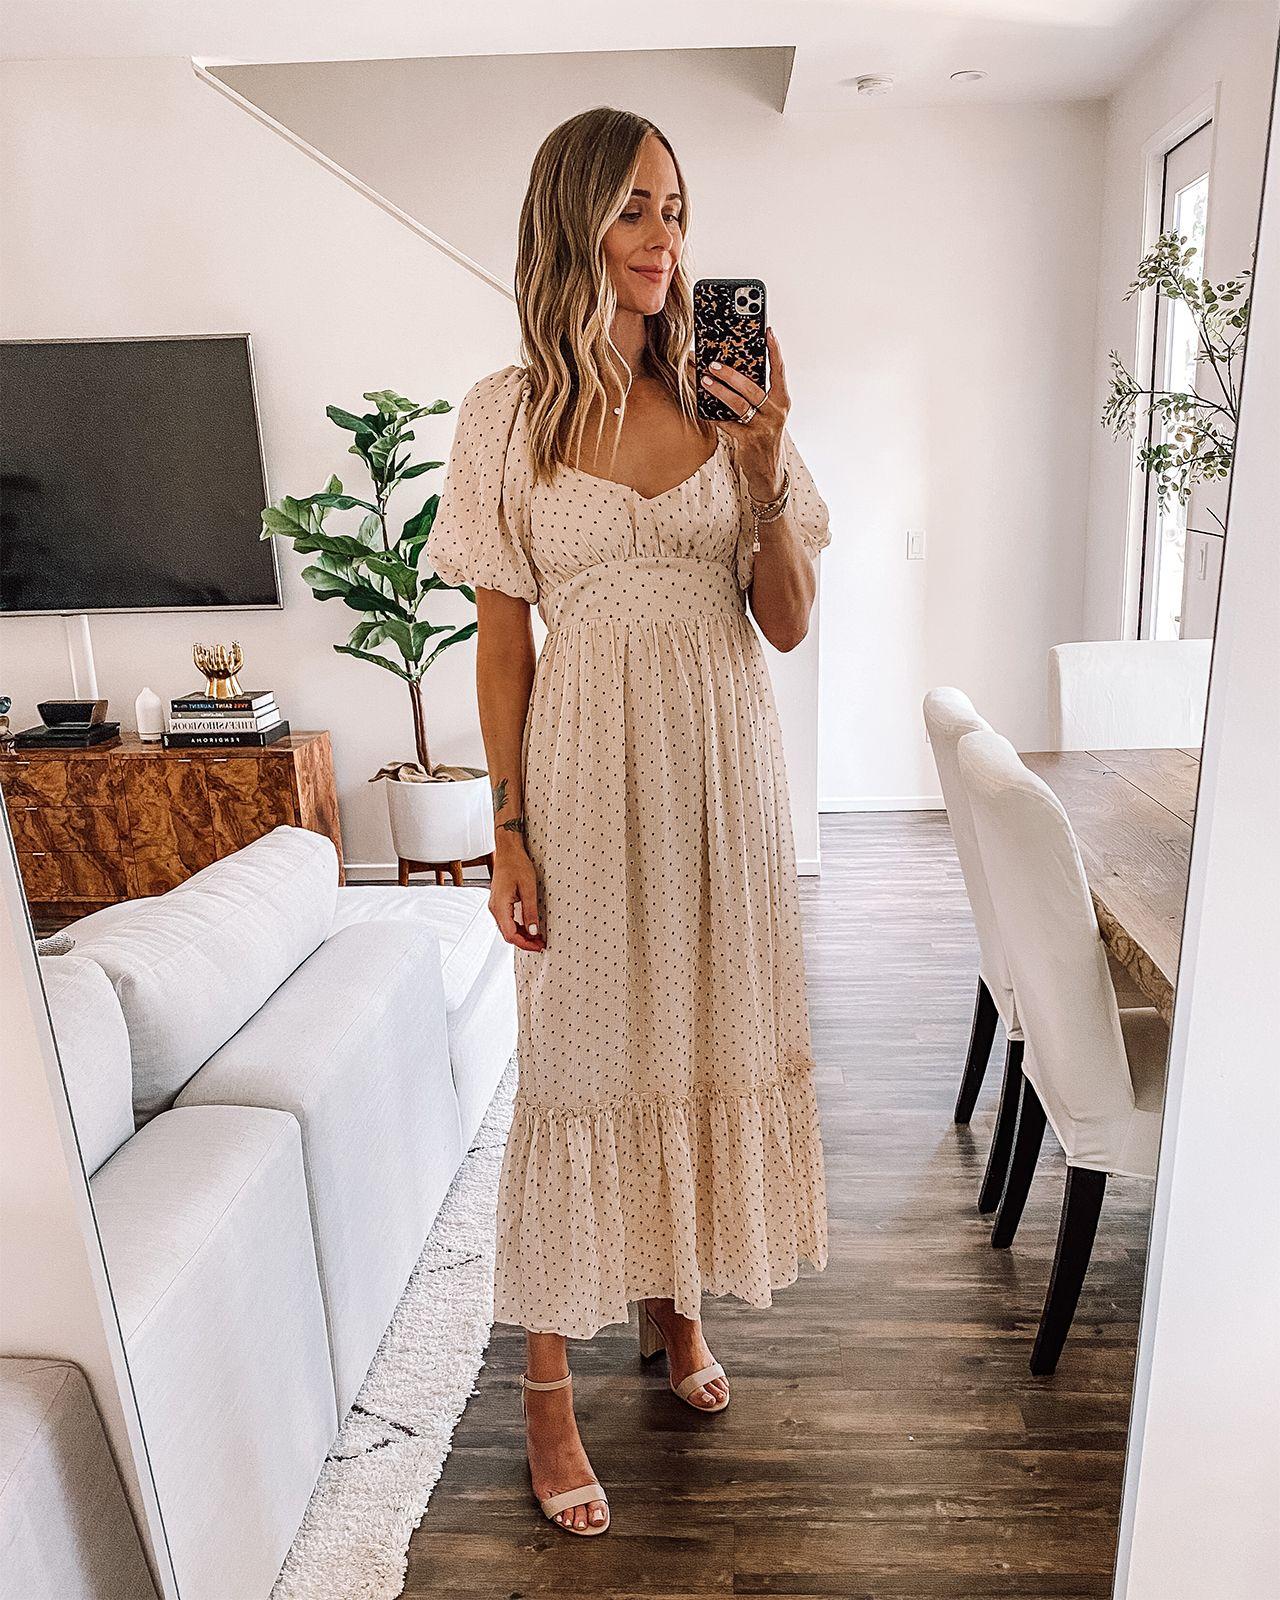 Fashion Jackson Wearing Beige Polka Dot Ruffle Maxi Dress Affordable Summer Dresses Neutral Summer Dresses Best Summer Dresses [ 1600 x 1280 Pixel ]